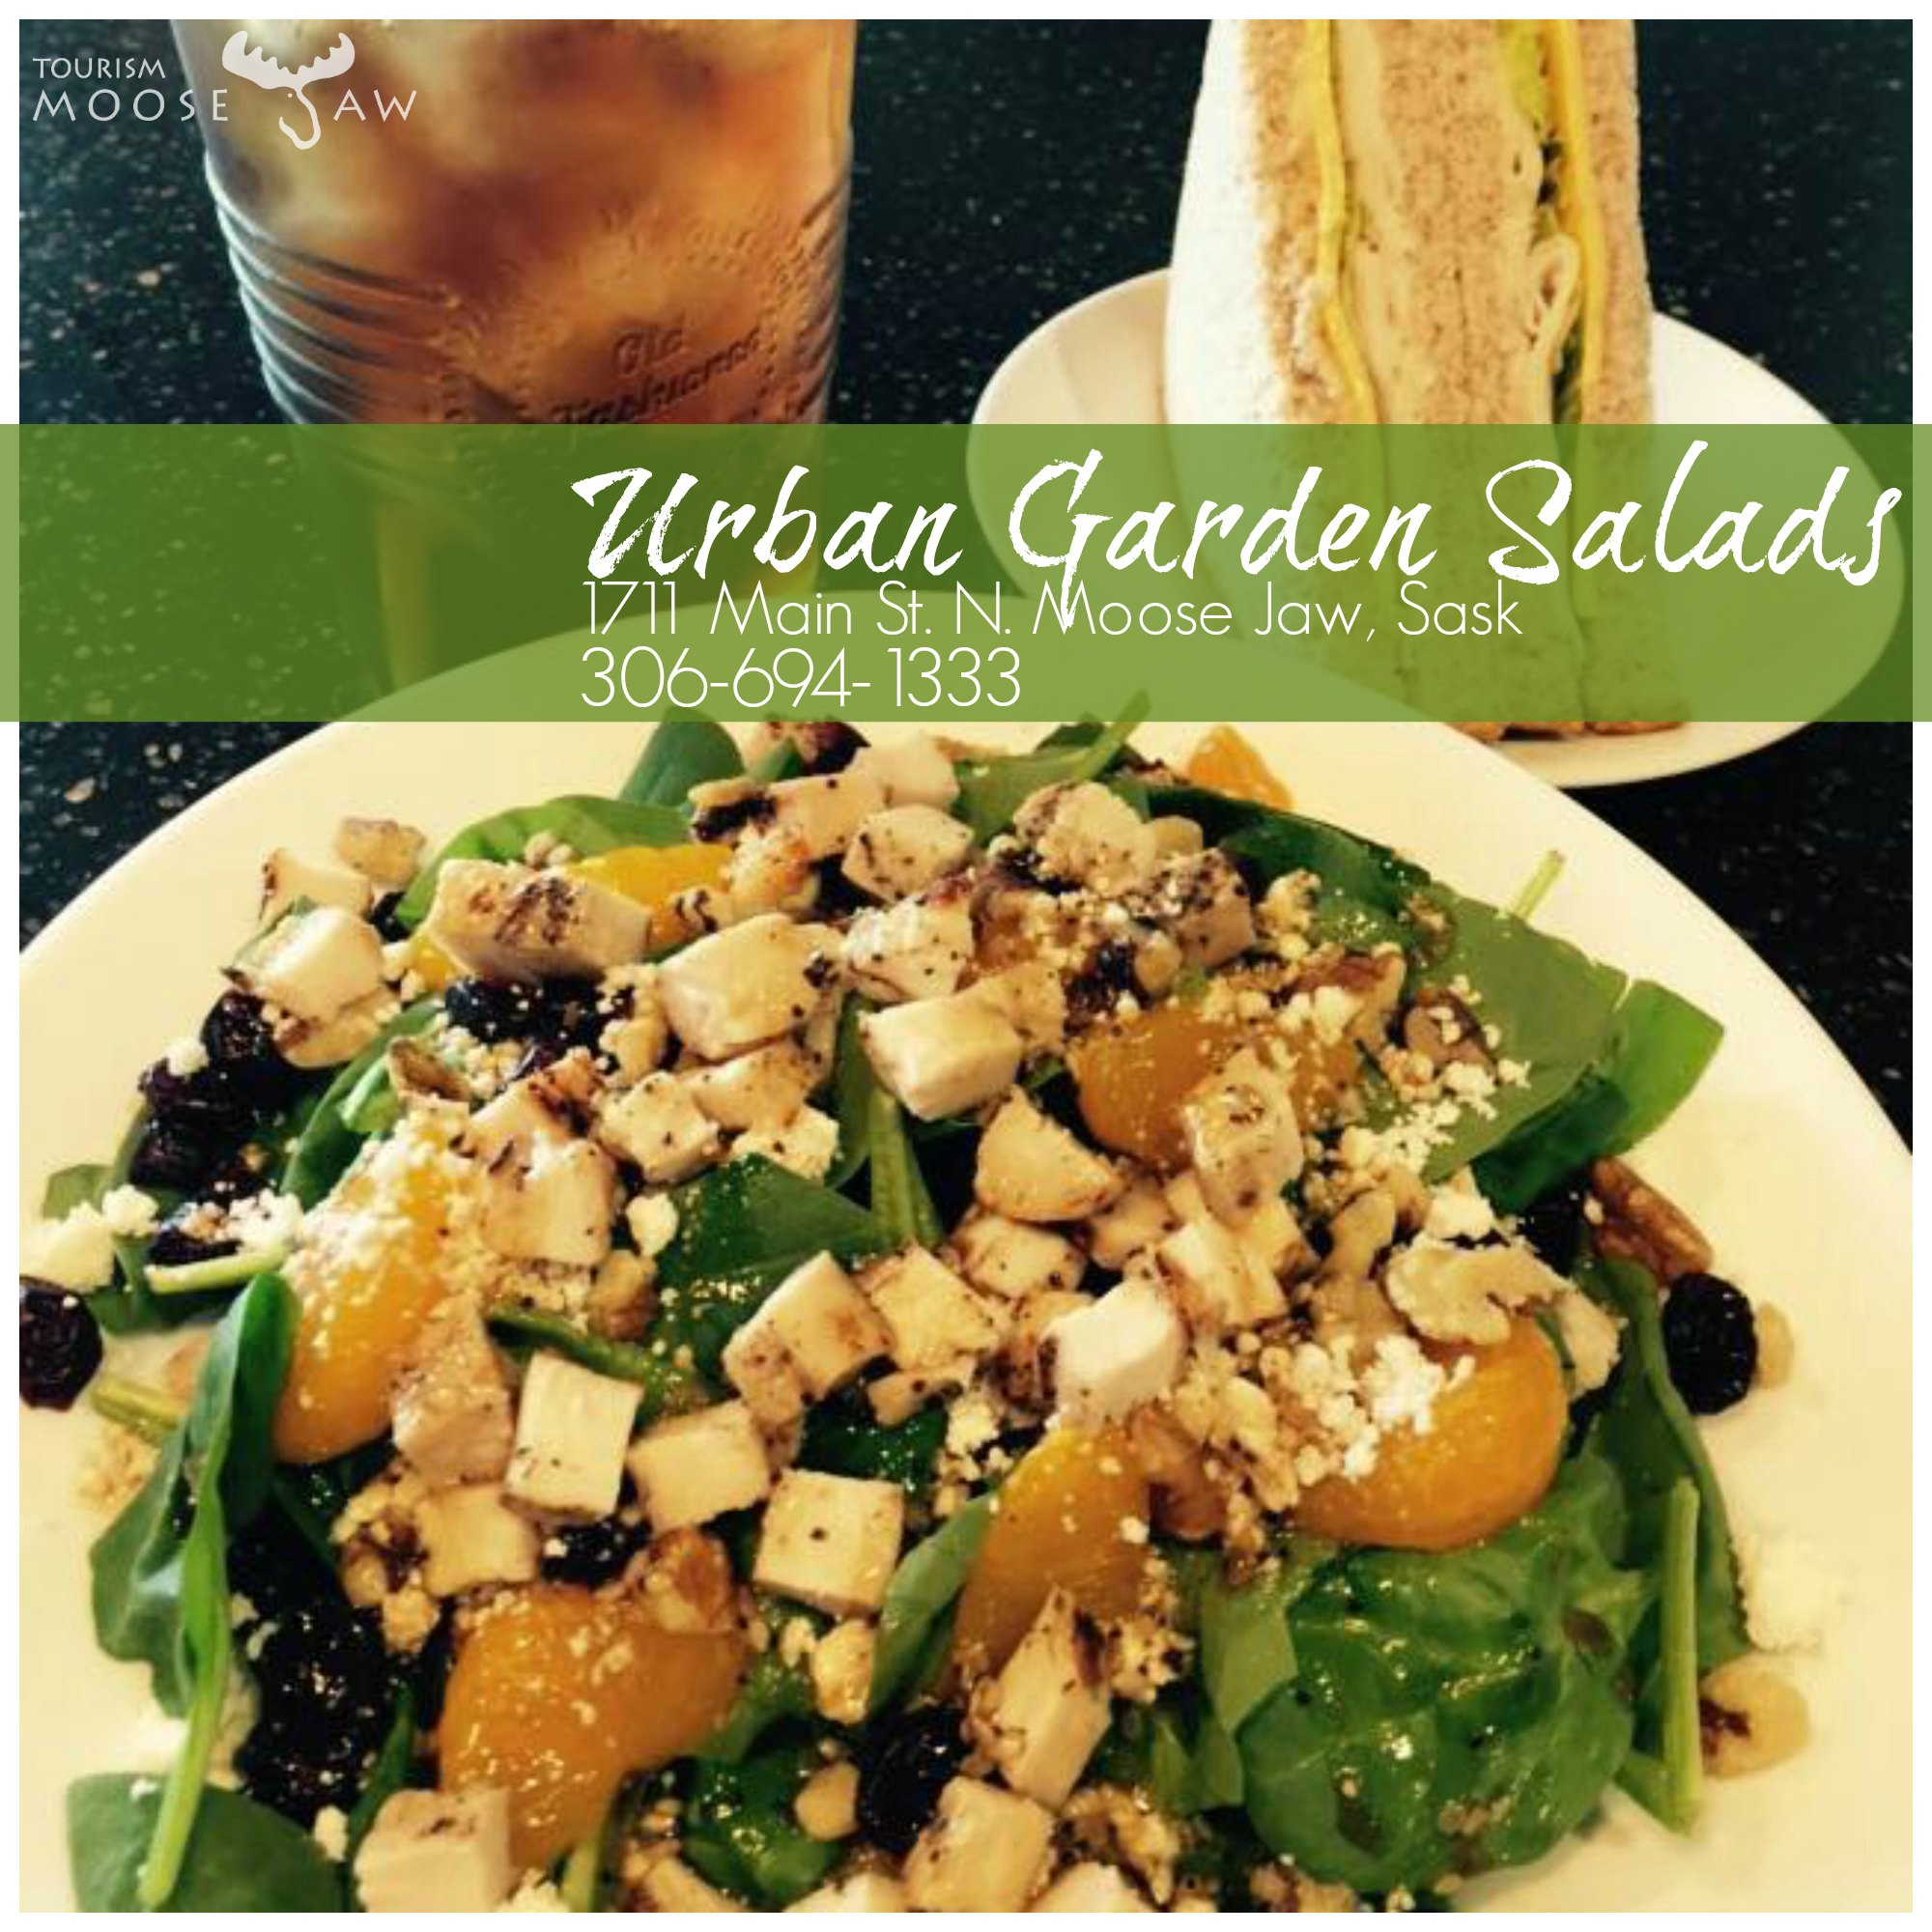 Urban Garden Salad.jpg